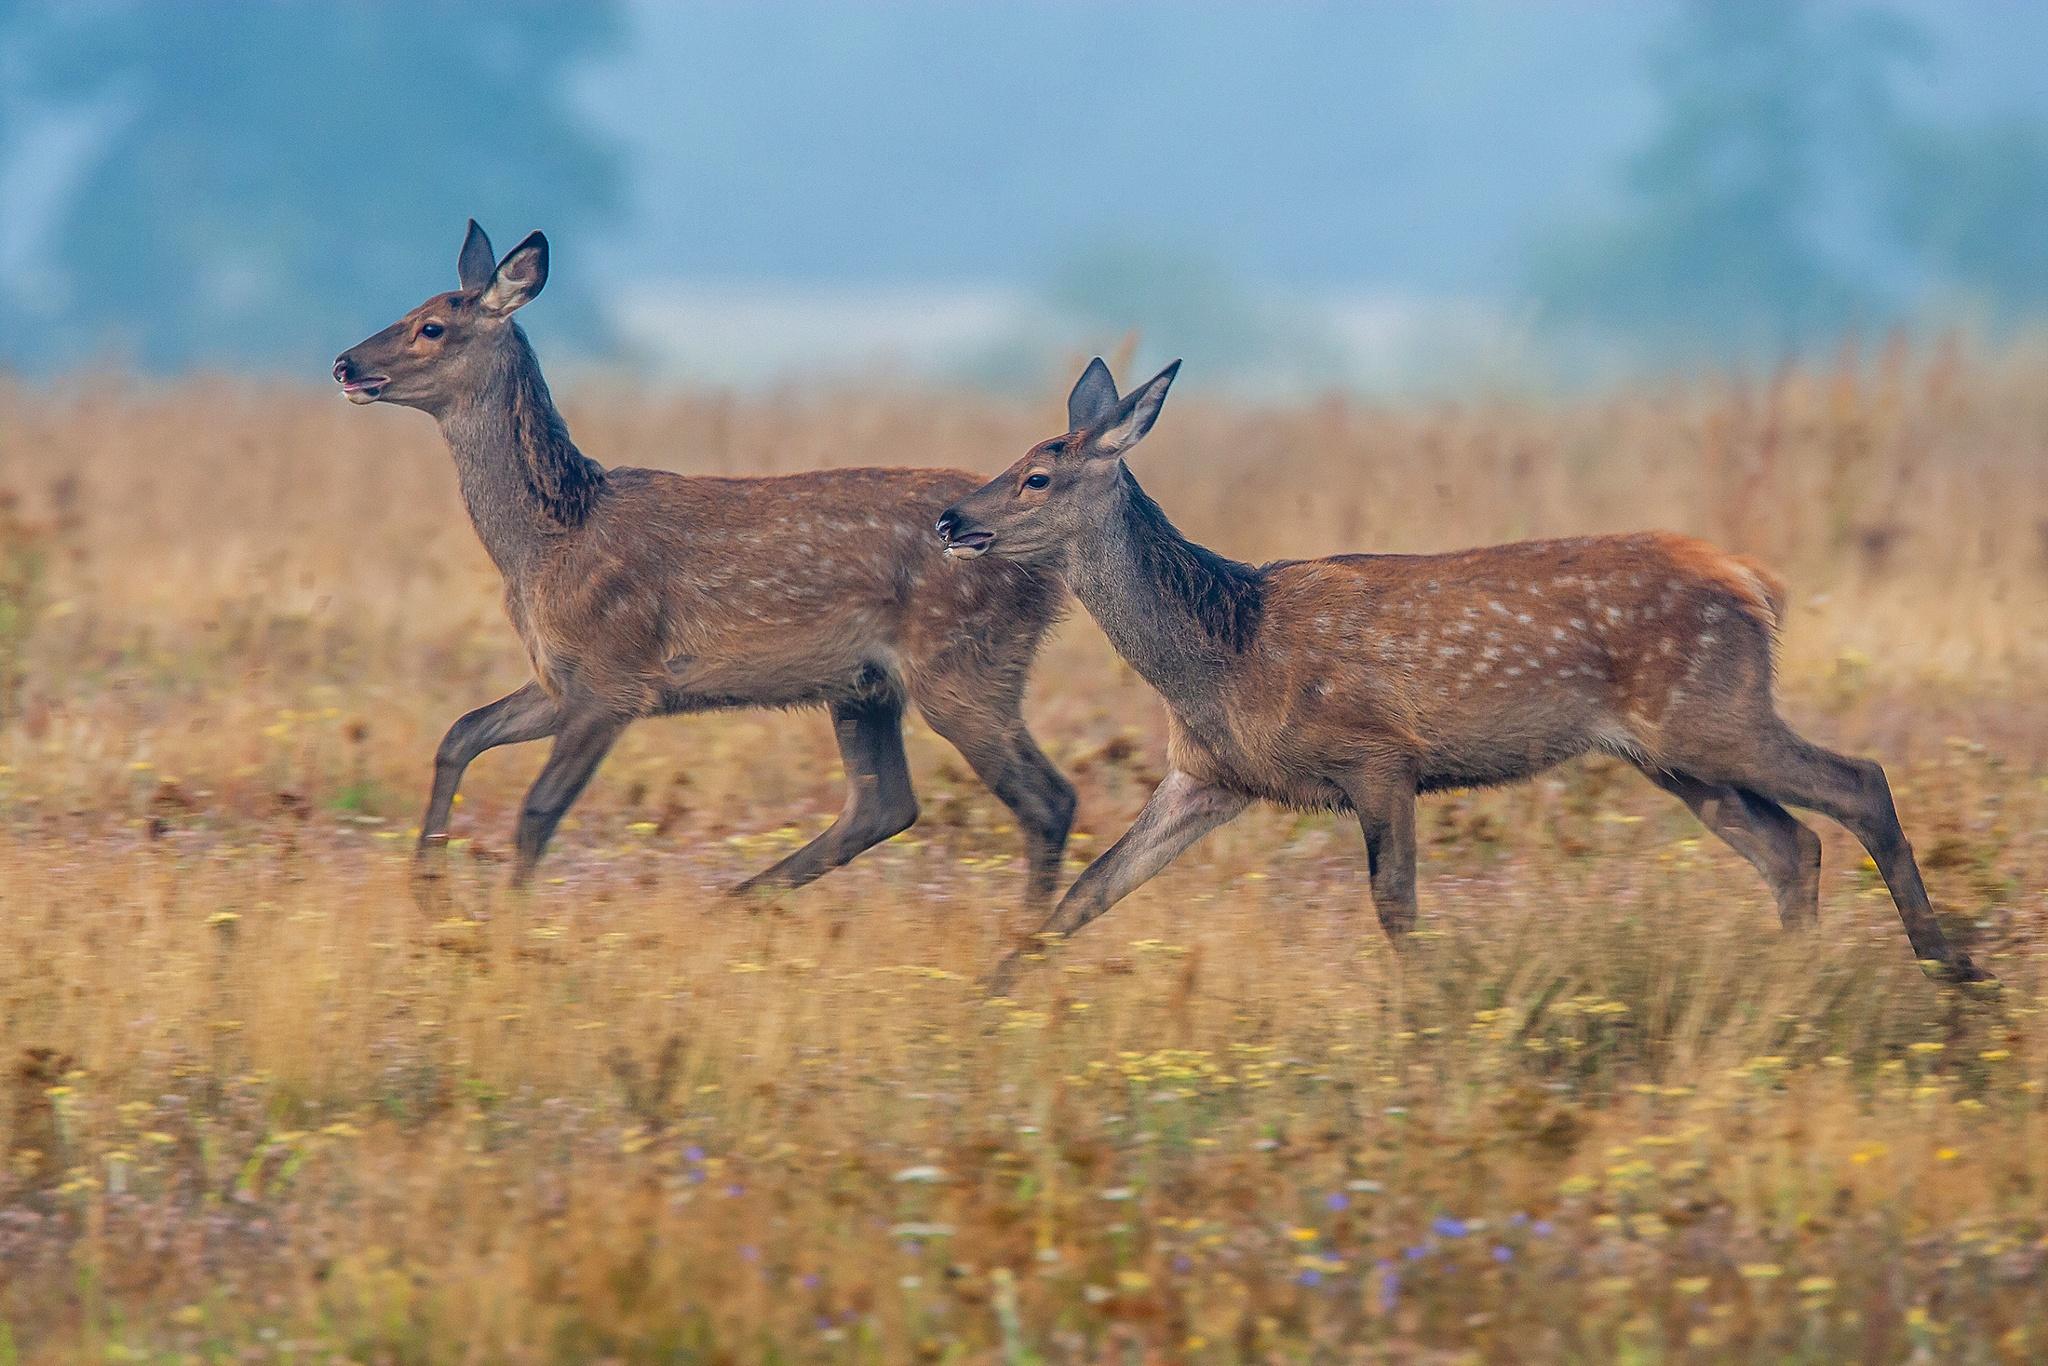 Running deer by Håkan Liljenberg